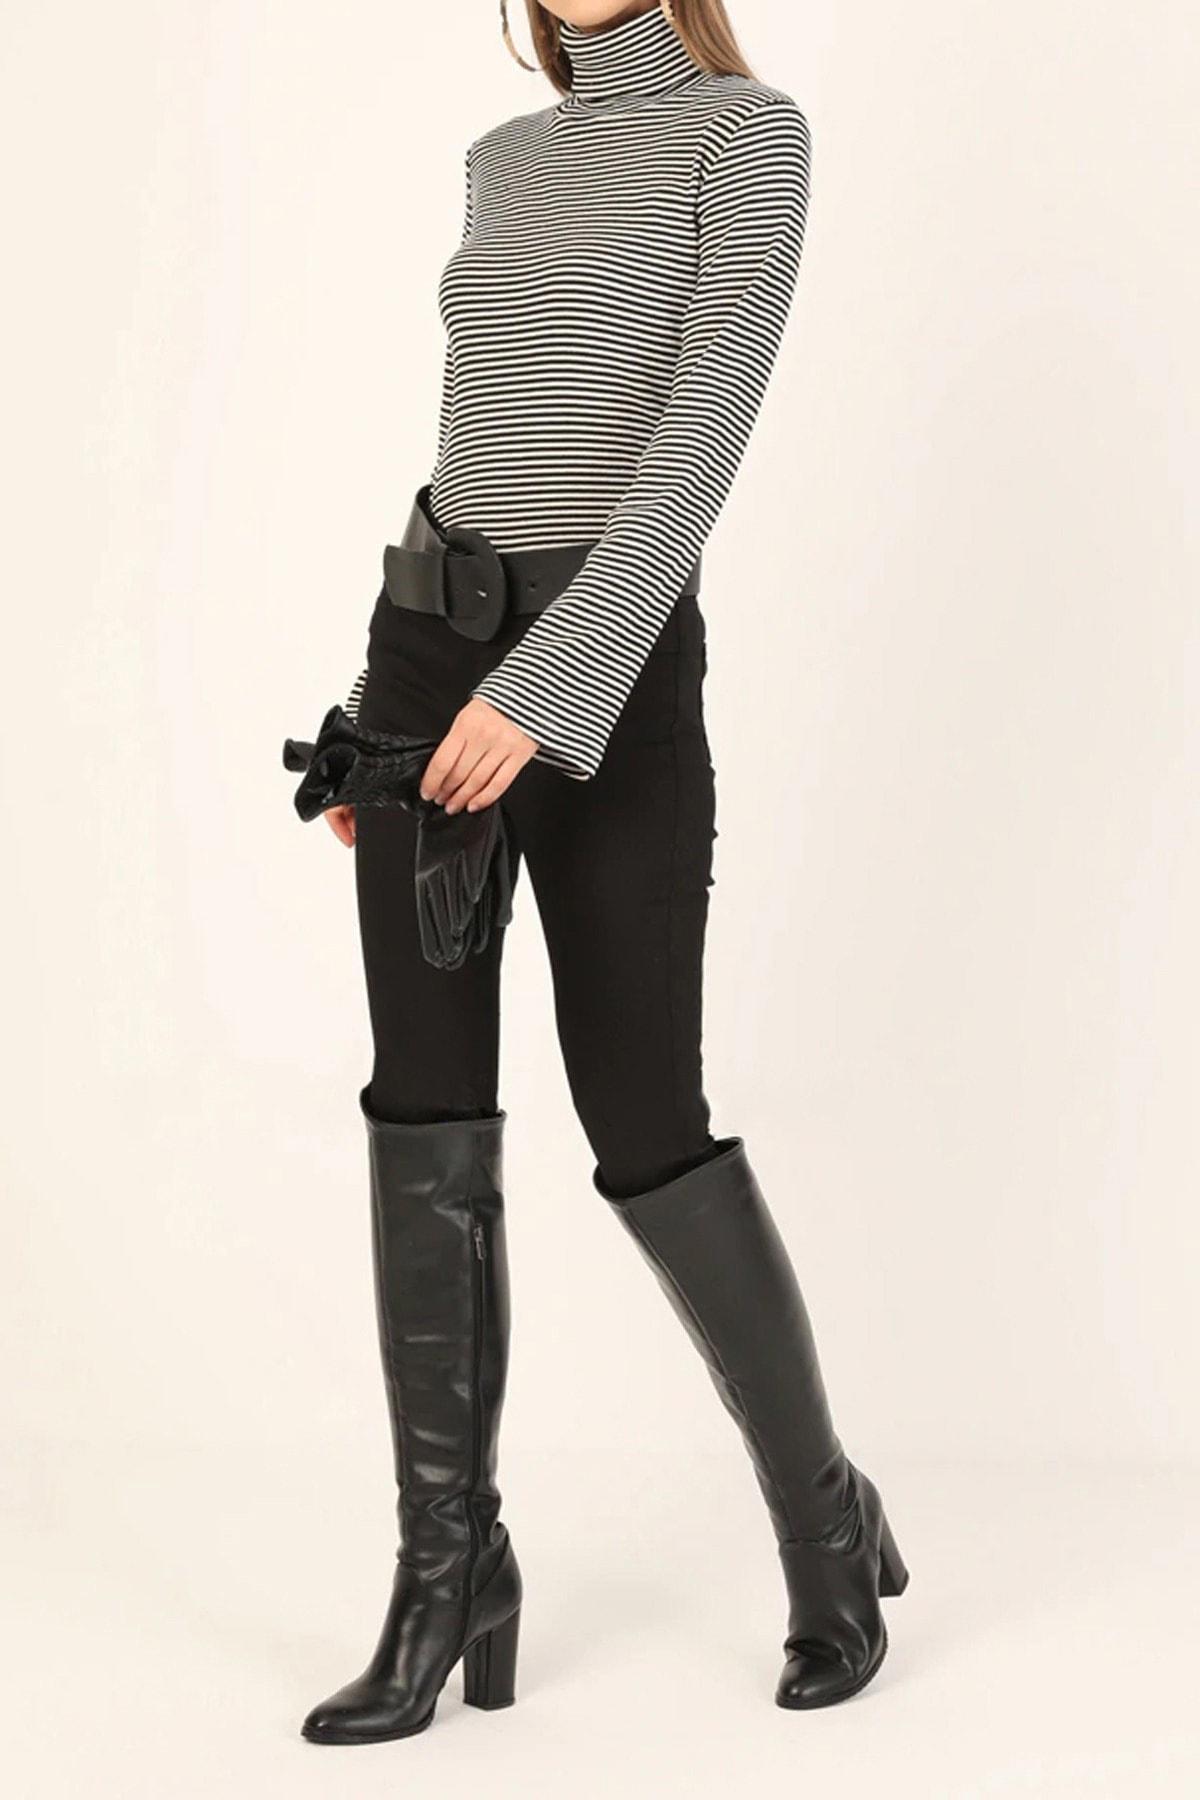 Kadın Siyah Çizgili Boğazlı Pamuklu Bluz